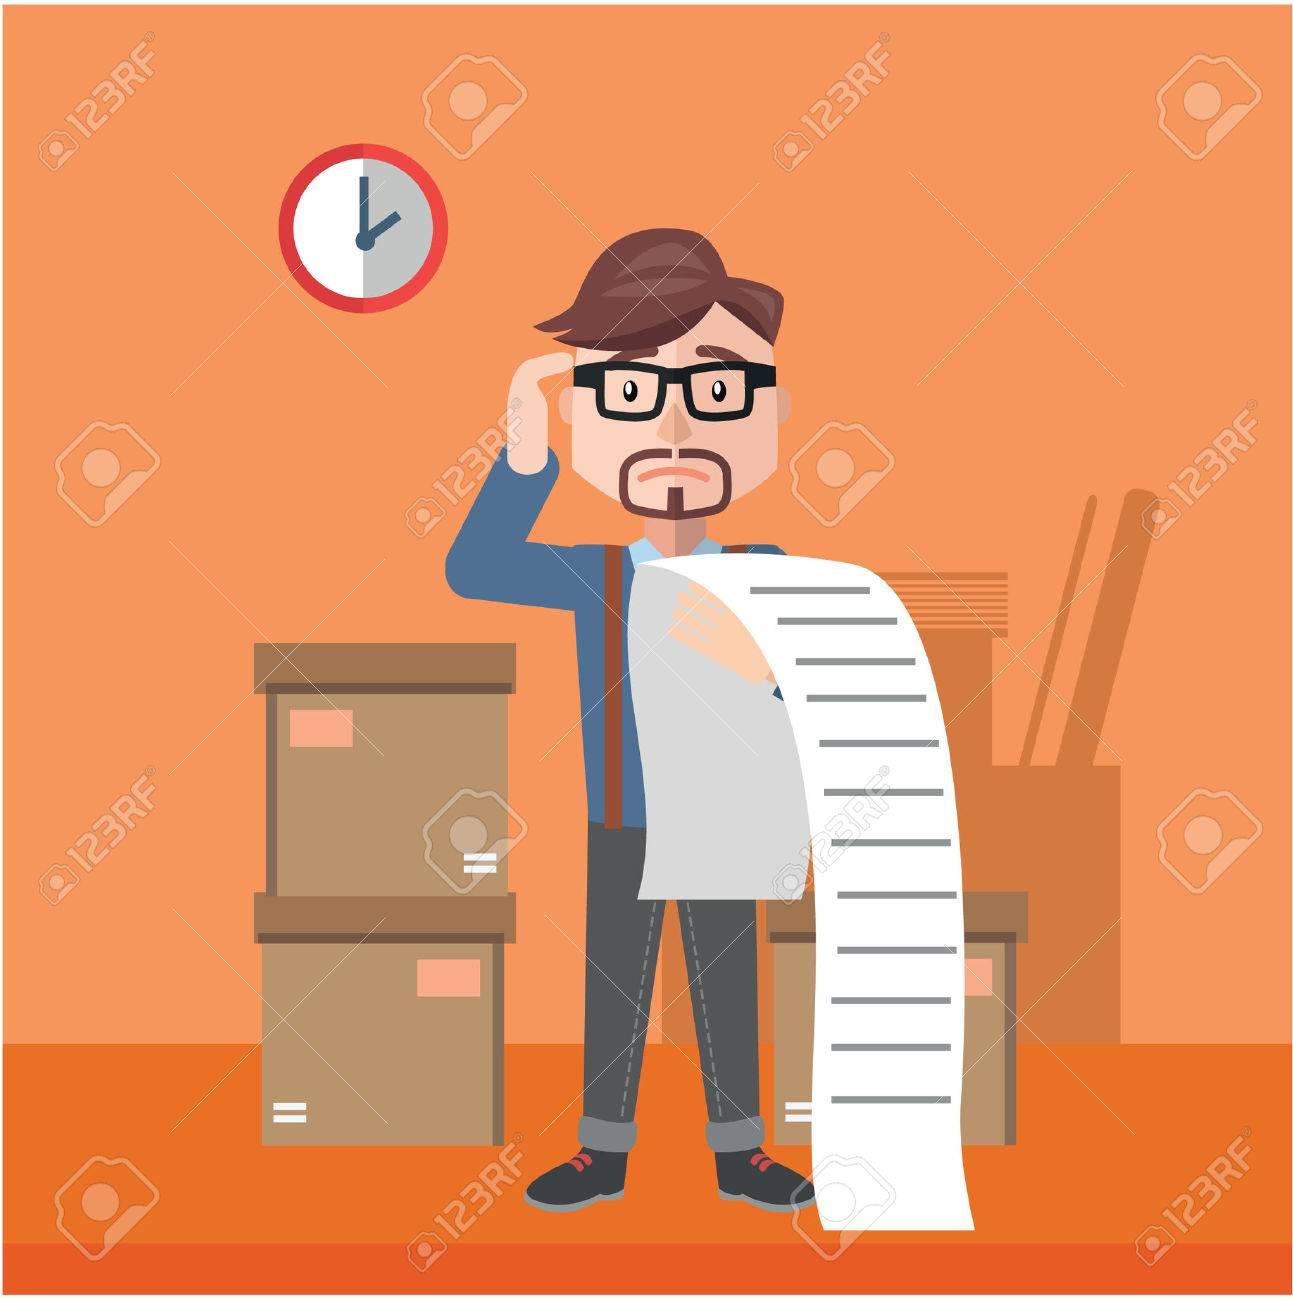 businessman confused bill flat color cartoon illustration - 51018493